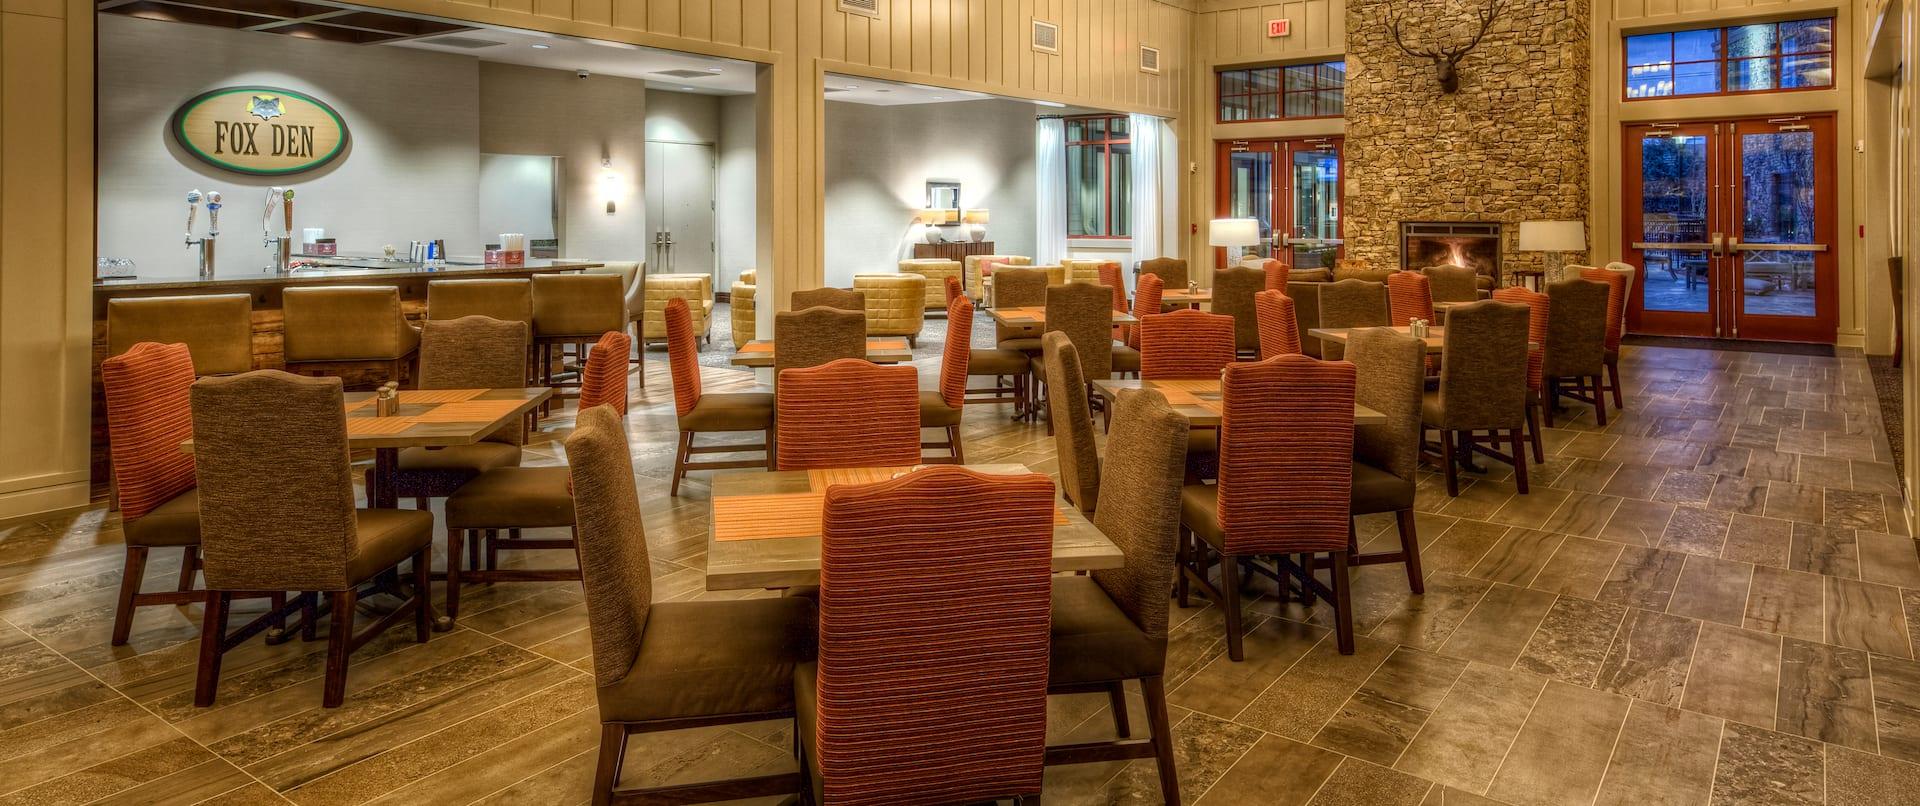 Fox Den Restaurant And Bar Dining Area